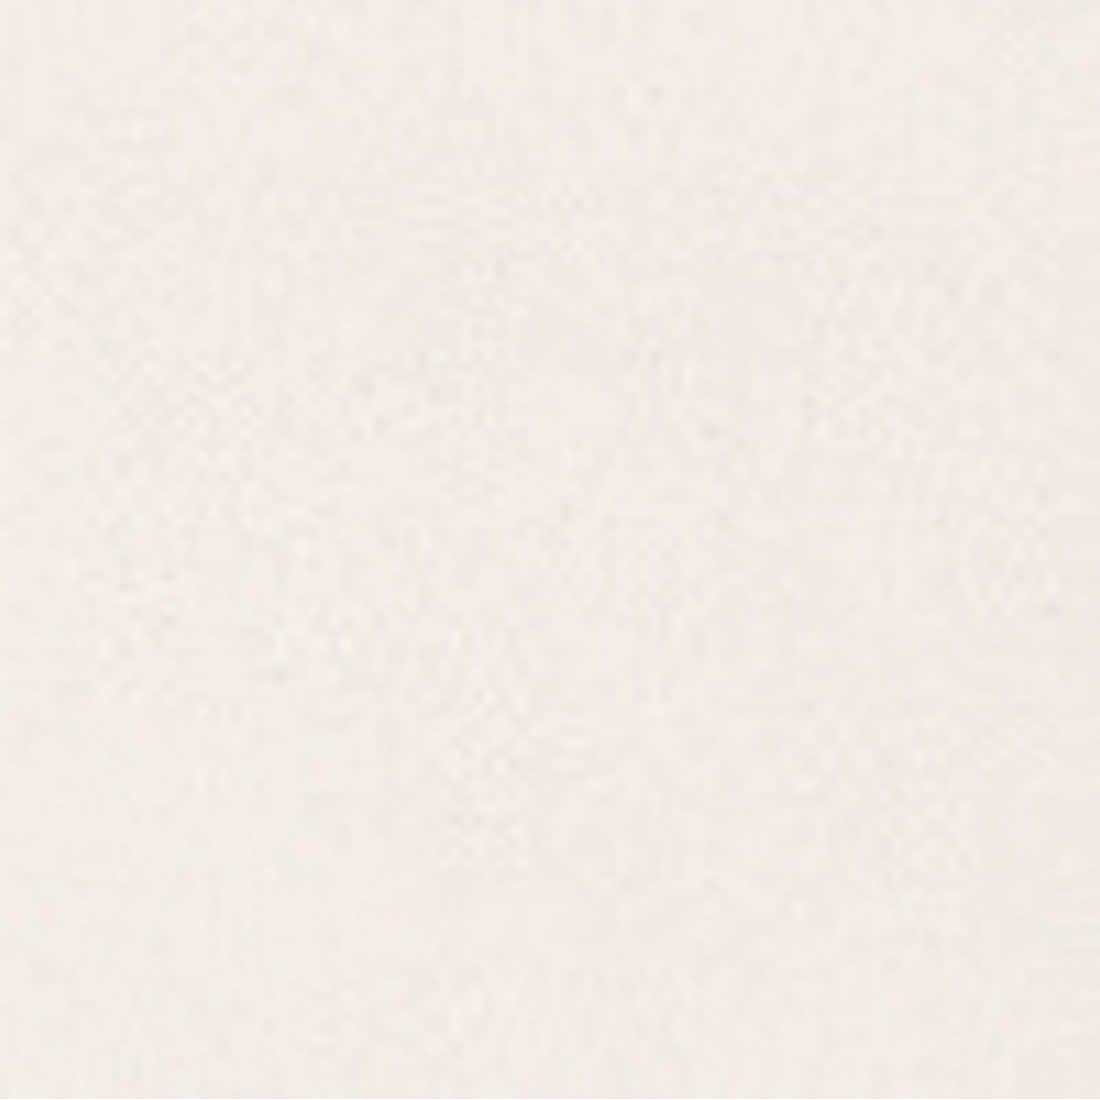 Porcelanato Porrtinari 58,4 x 58,4 Silex WH Hard Ref 55763